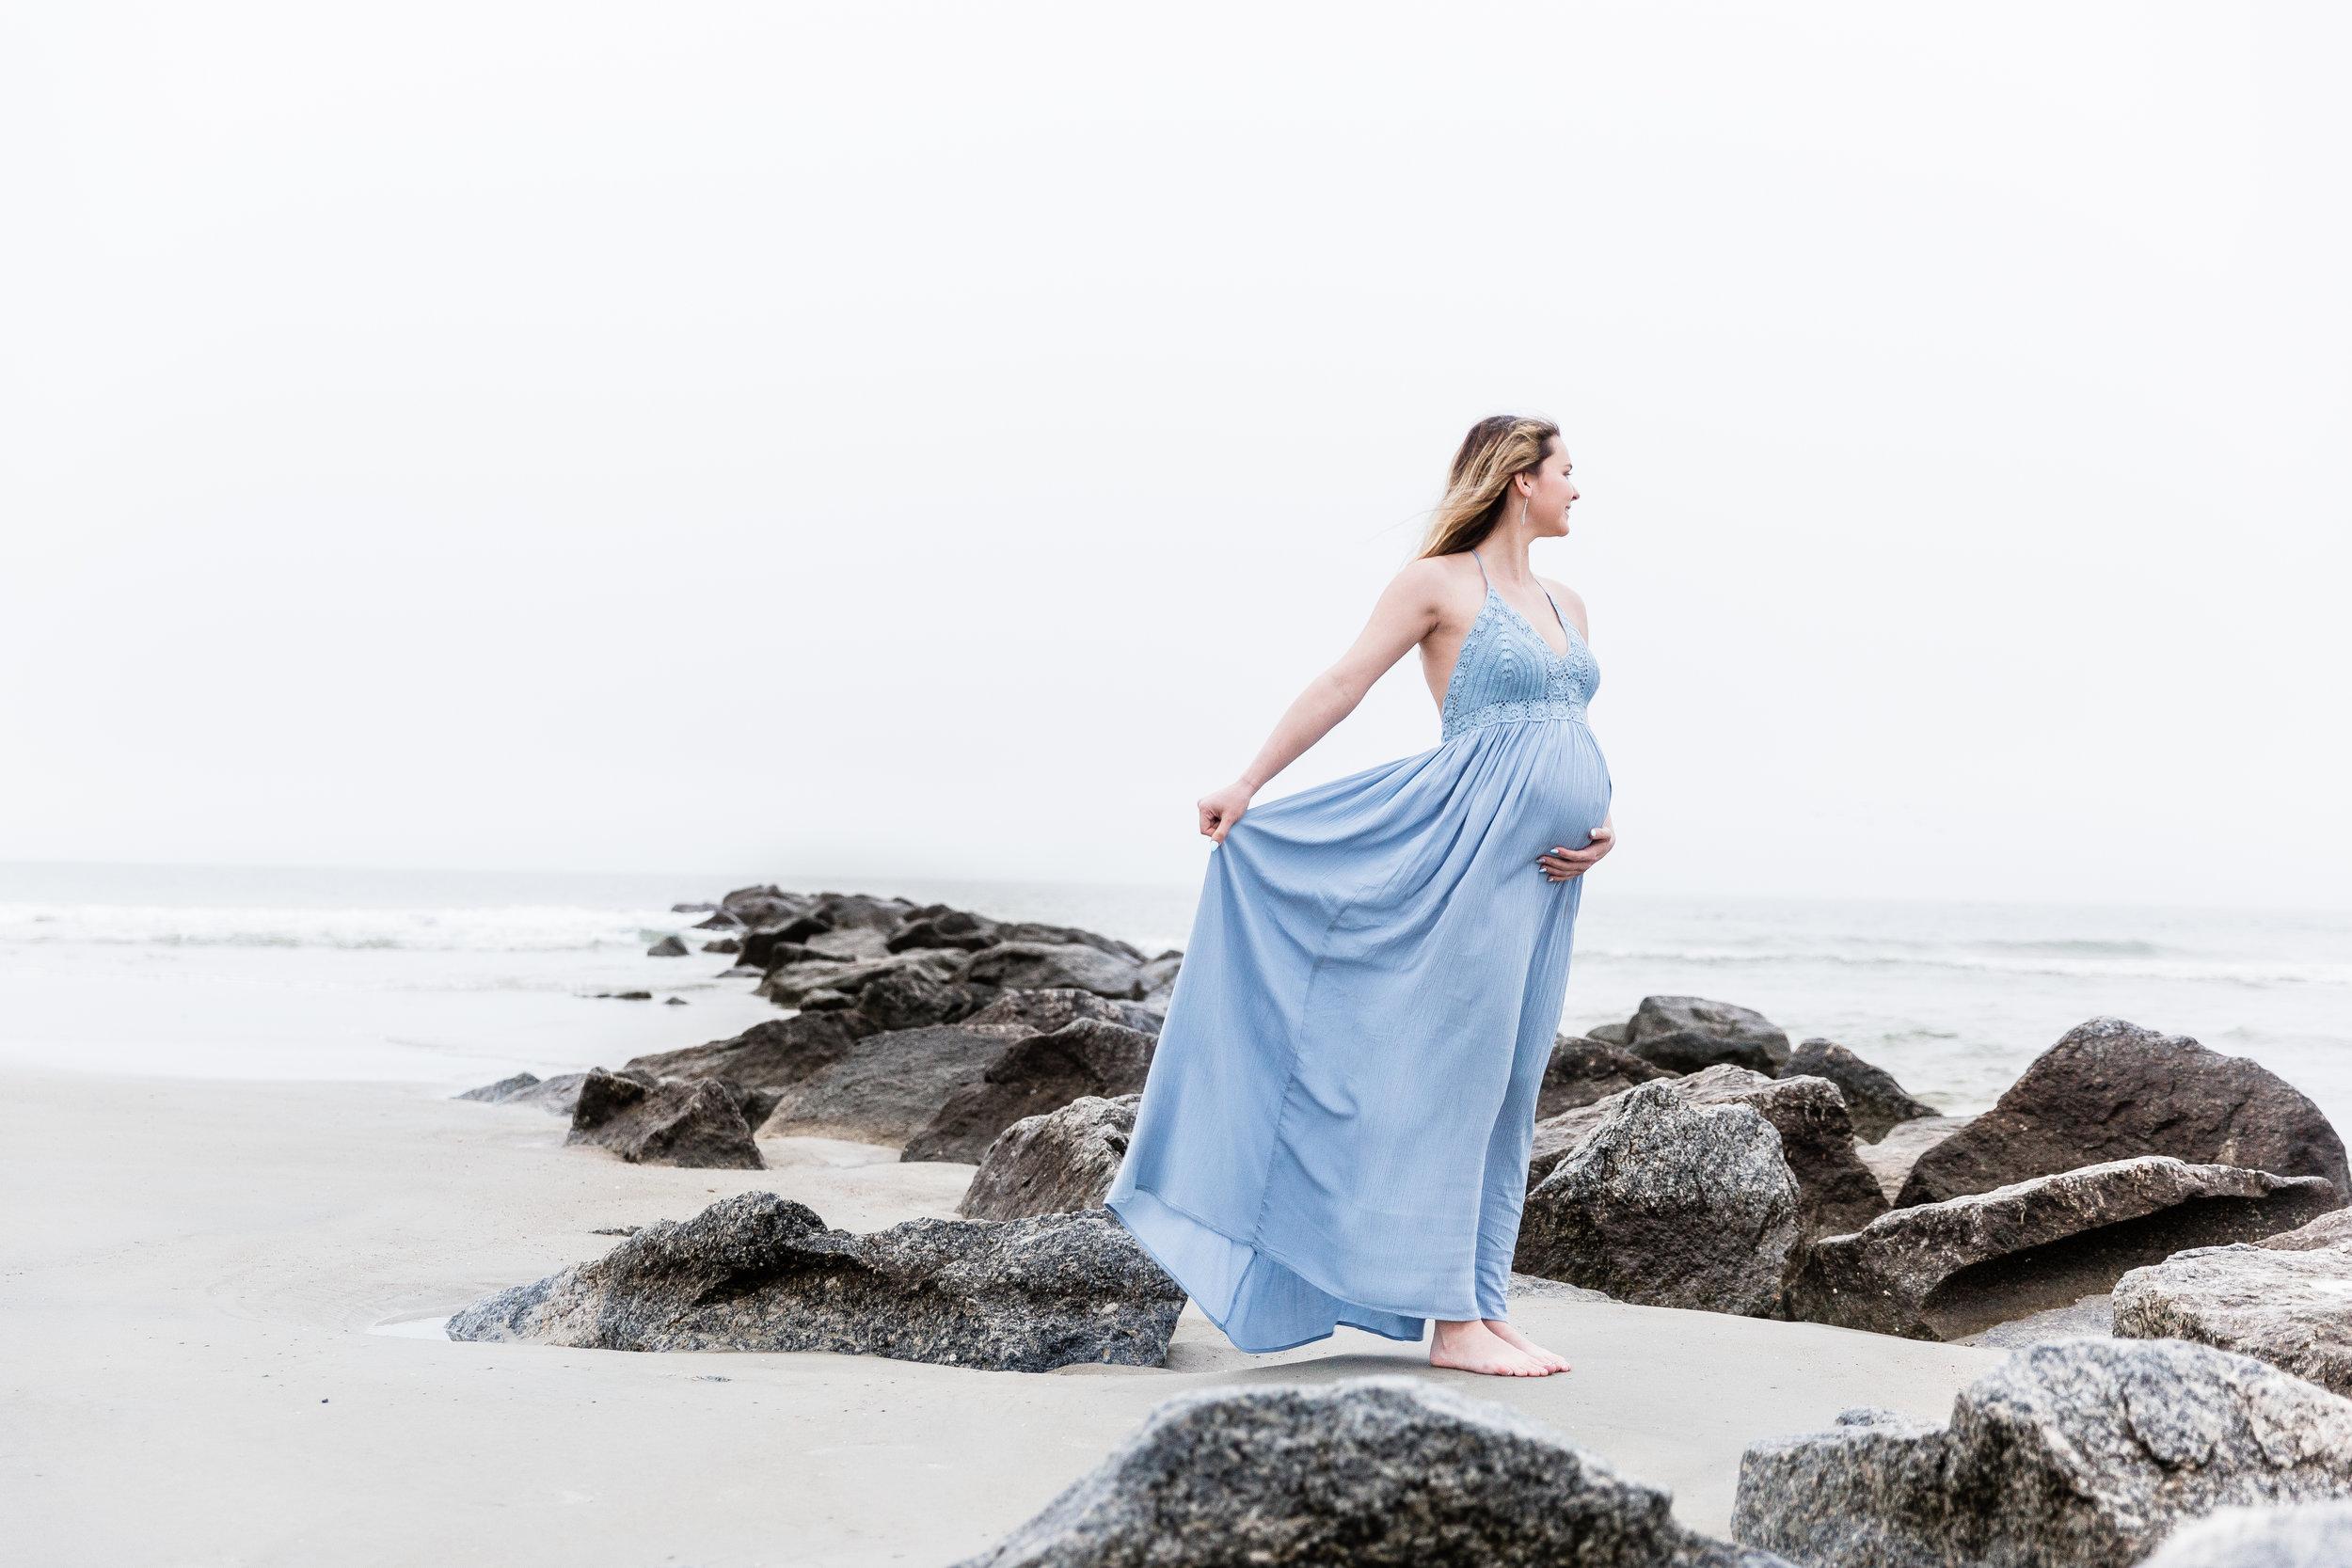 Savannah_Georgia_Photographer_Southern_Lens_Photography_Savannah_Maternity_Tybee_Island_05.jpg